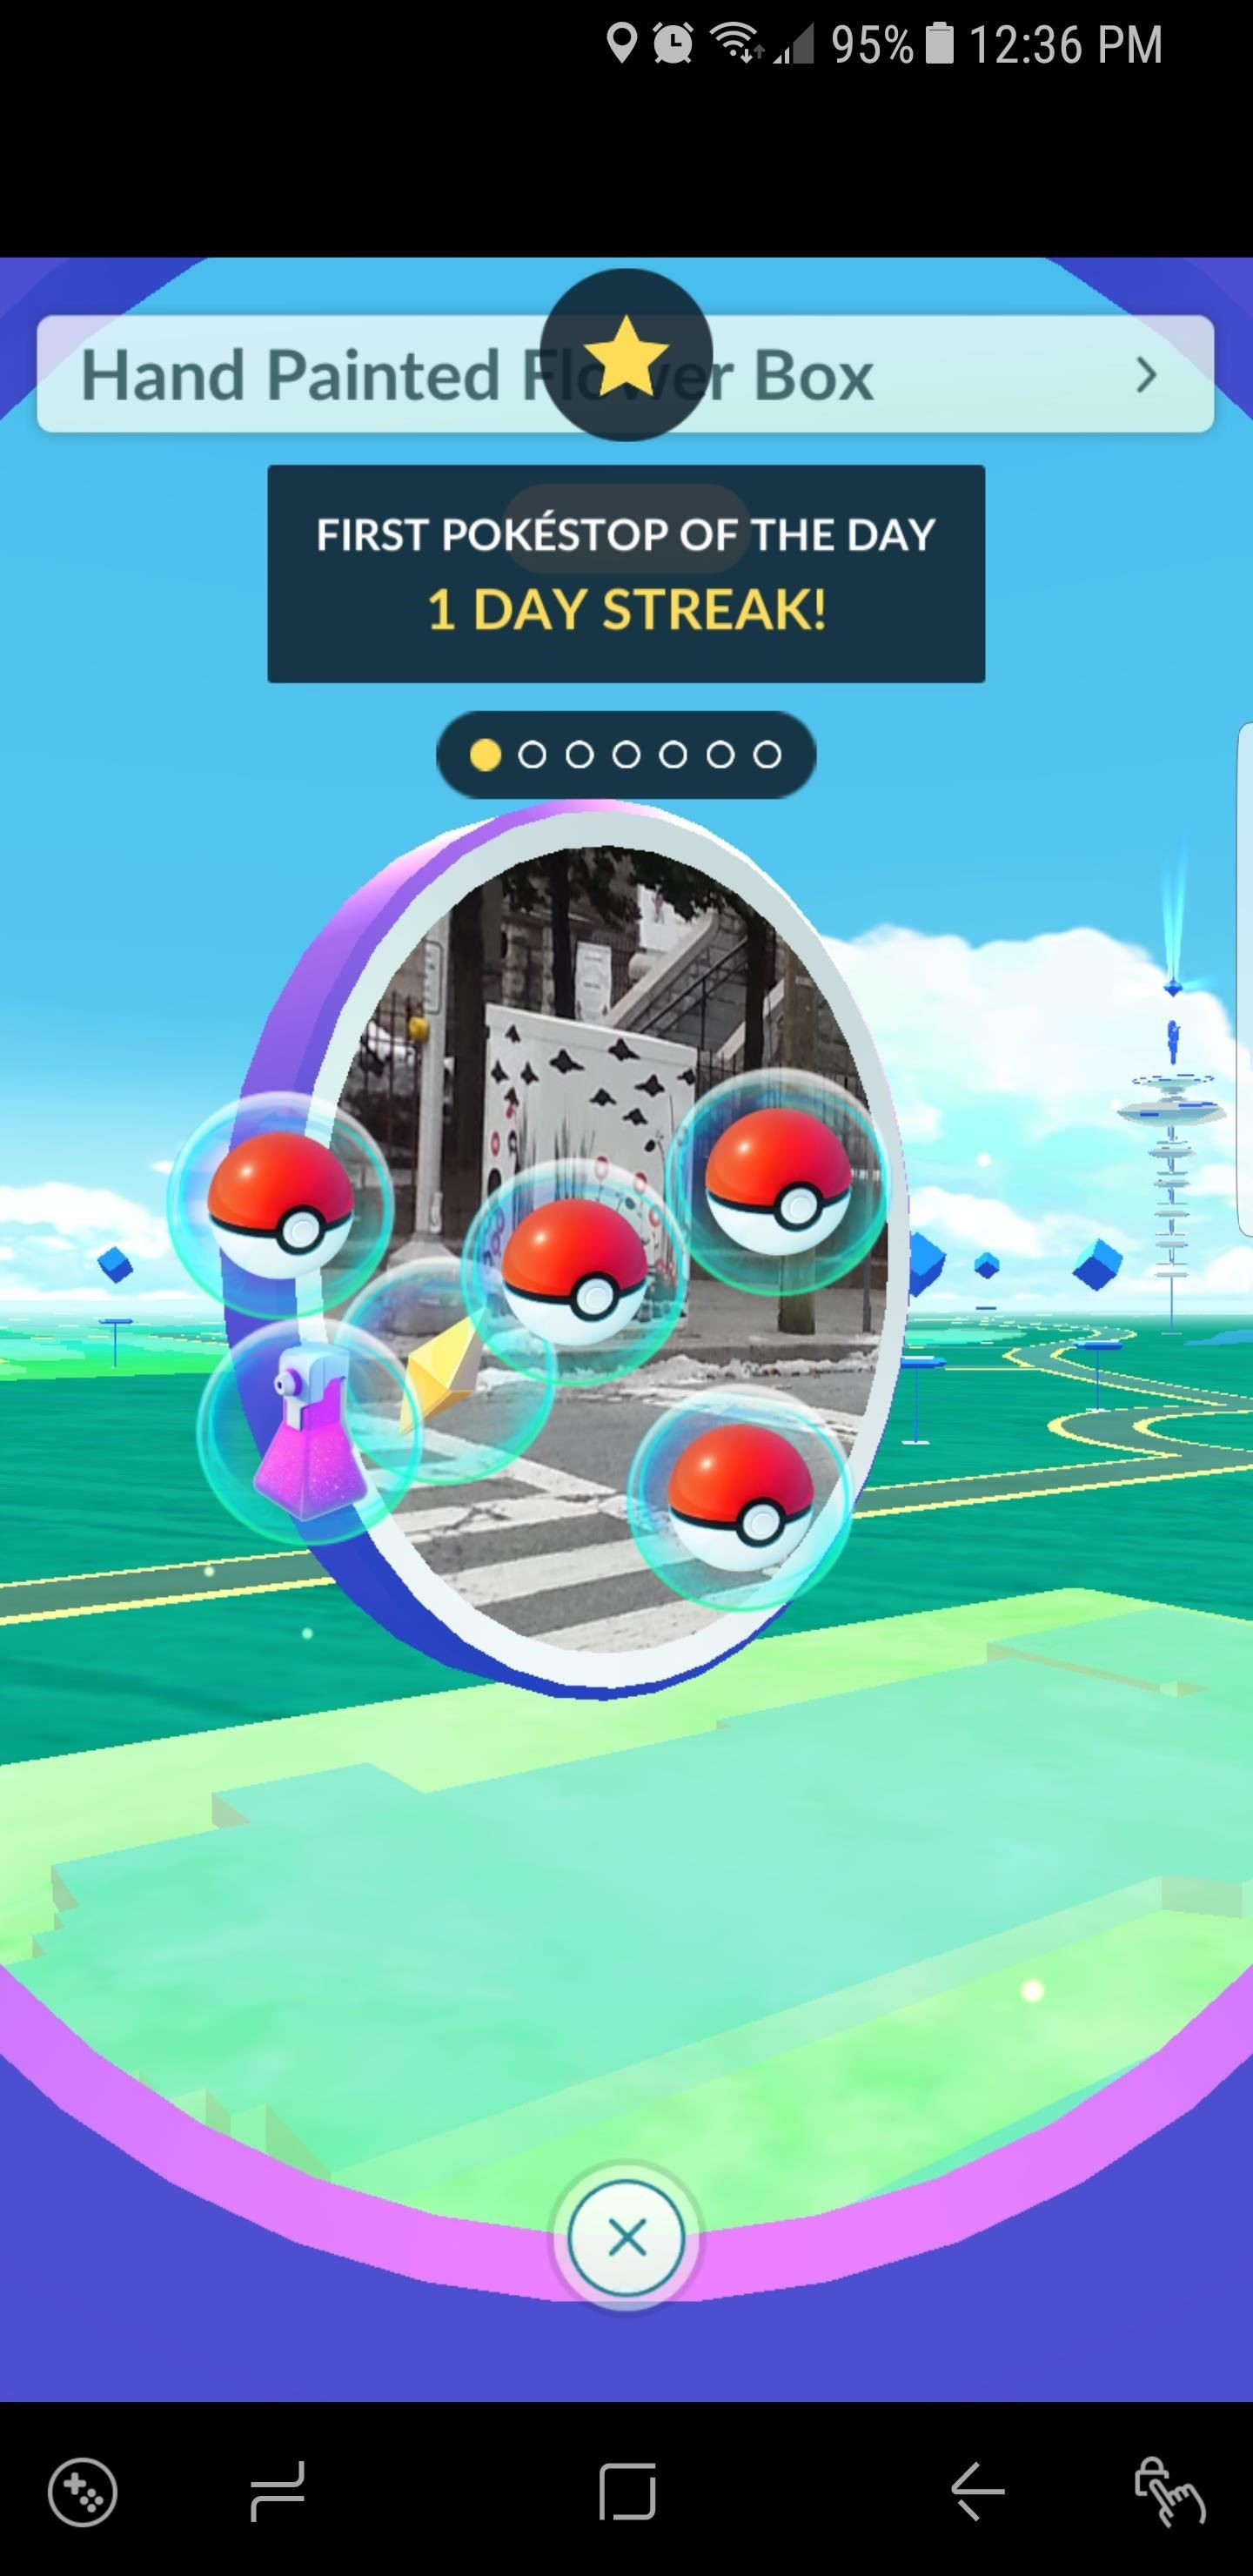 Despite Recent Updates, Pokémon GO Is Still Vulnerable to Hackers